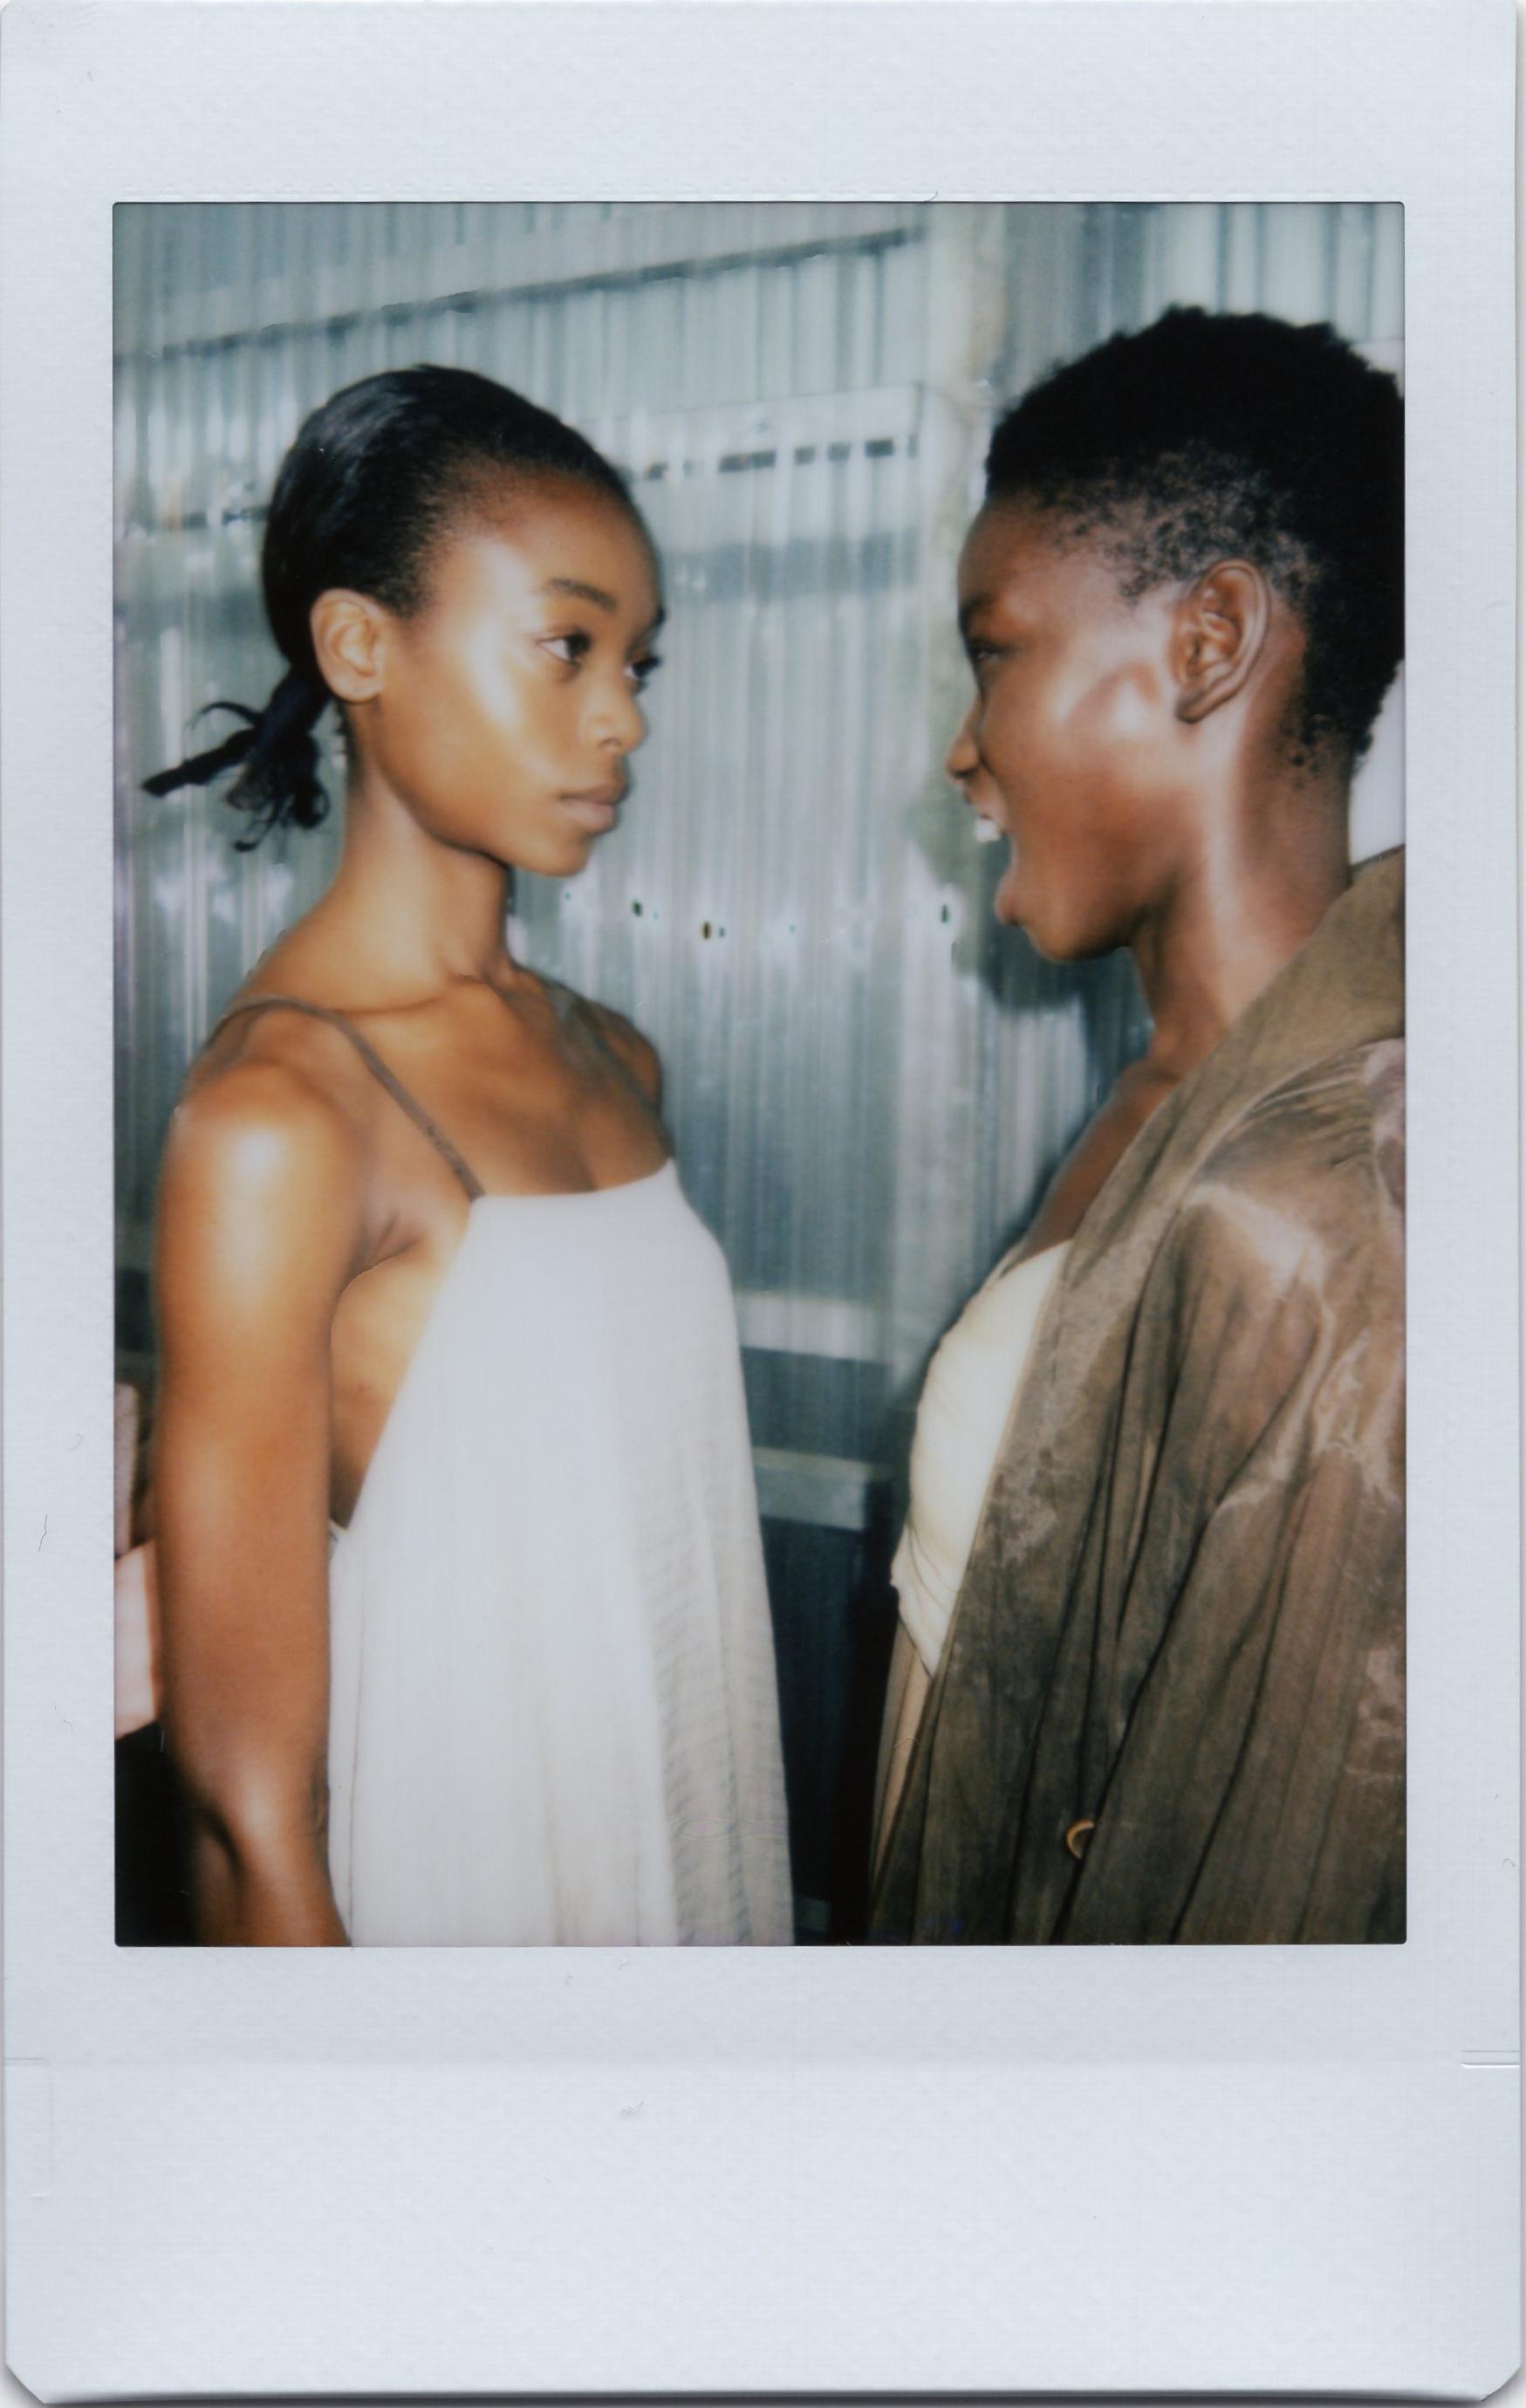 UmaWang_Honigschreck_Polaroid_5.jpg